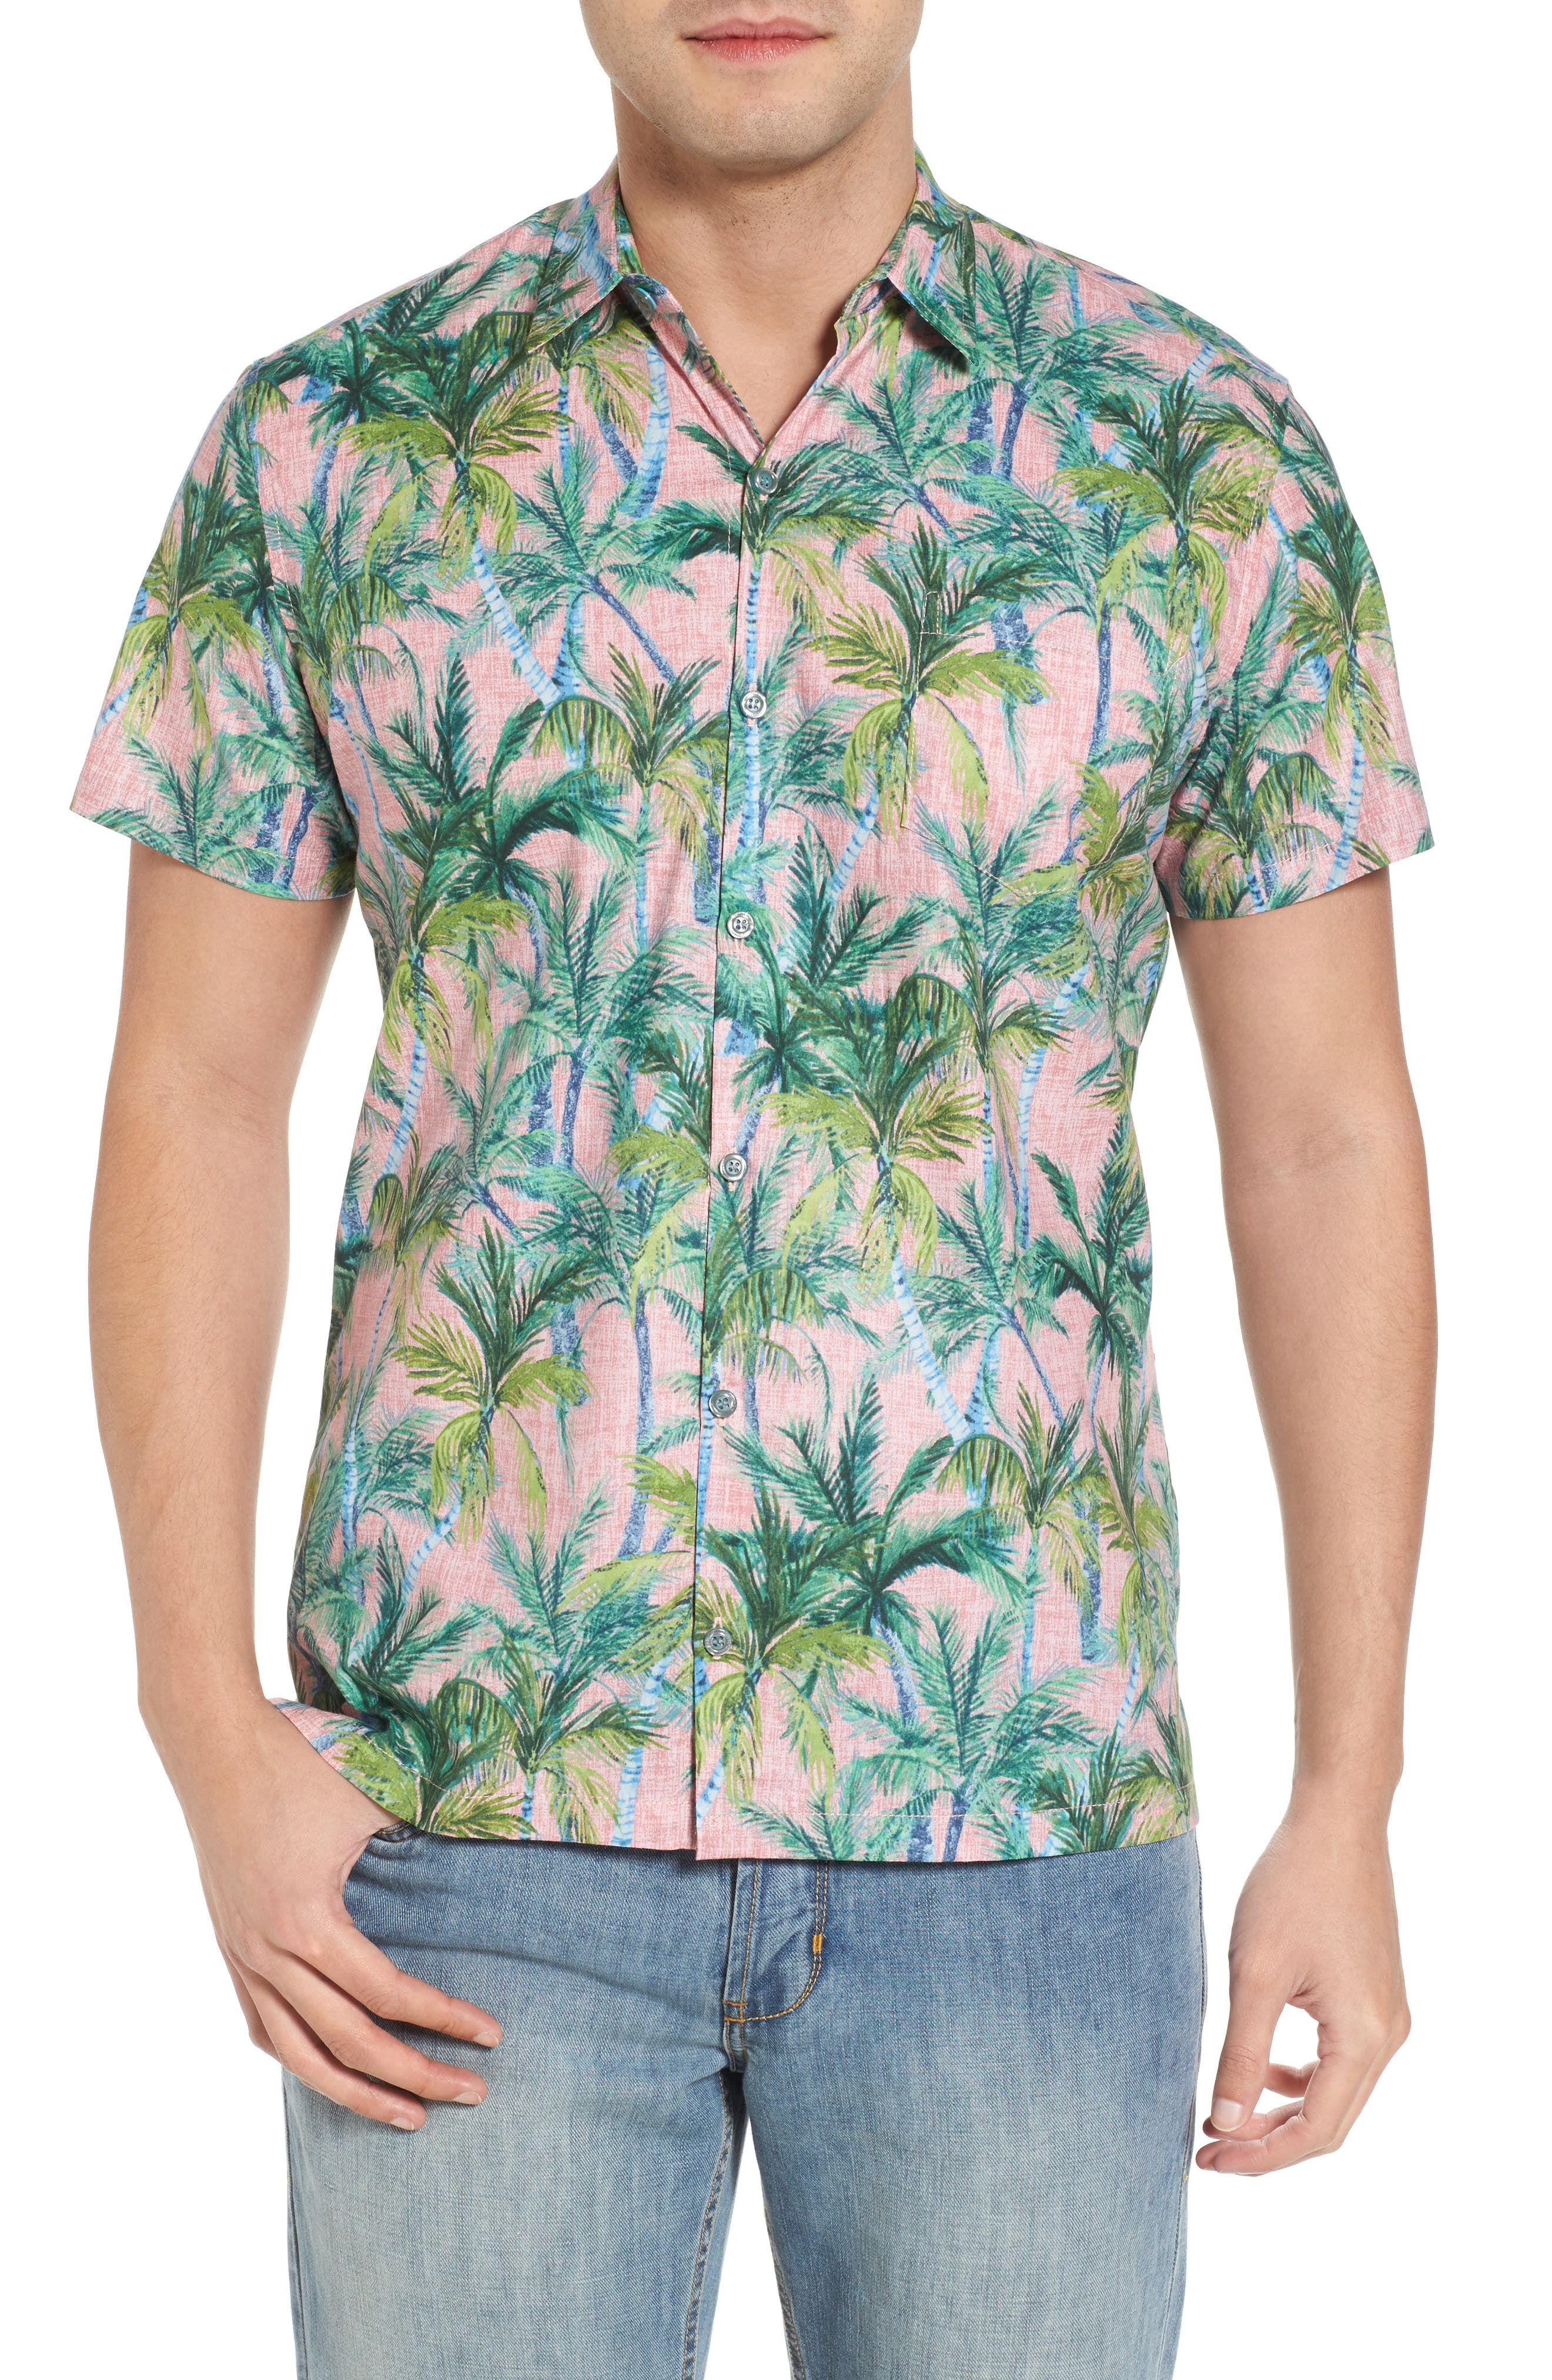 Tori Richard Coco Vida Trim Fit Print Cotton Lawn Sport Shirt